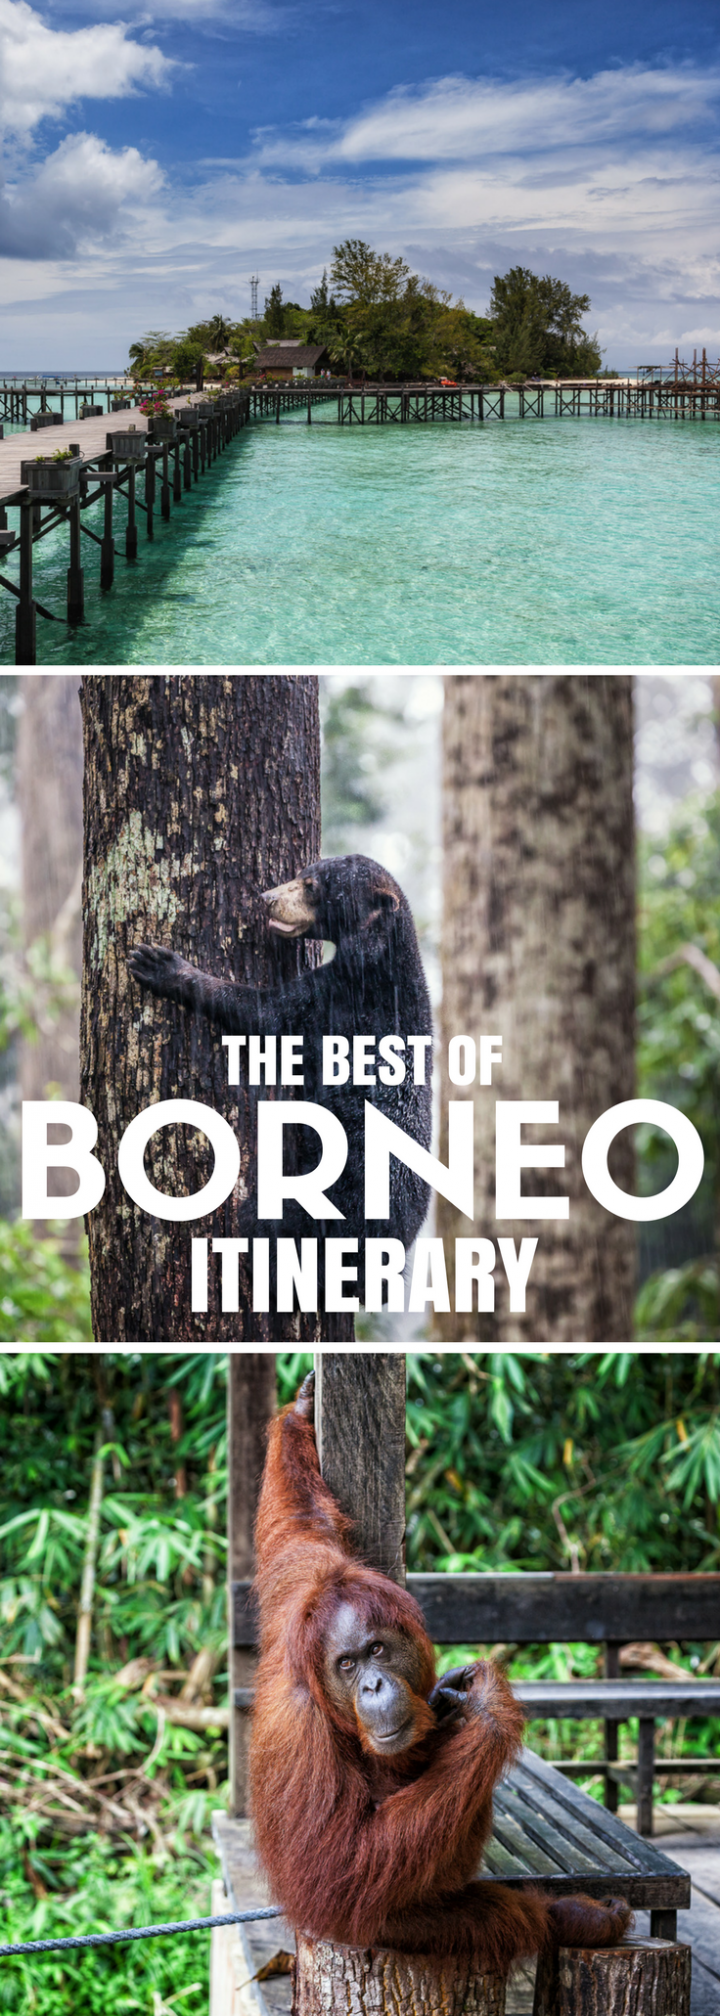 The best of Borneo squeezed into a 2-week itinerary: orangutans, proboscis monkeys, pygmy elephants,…